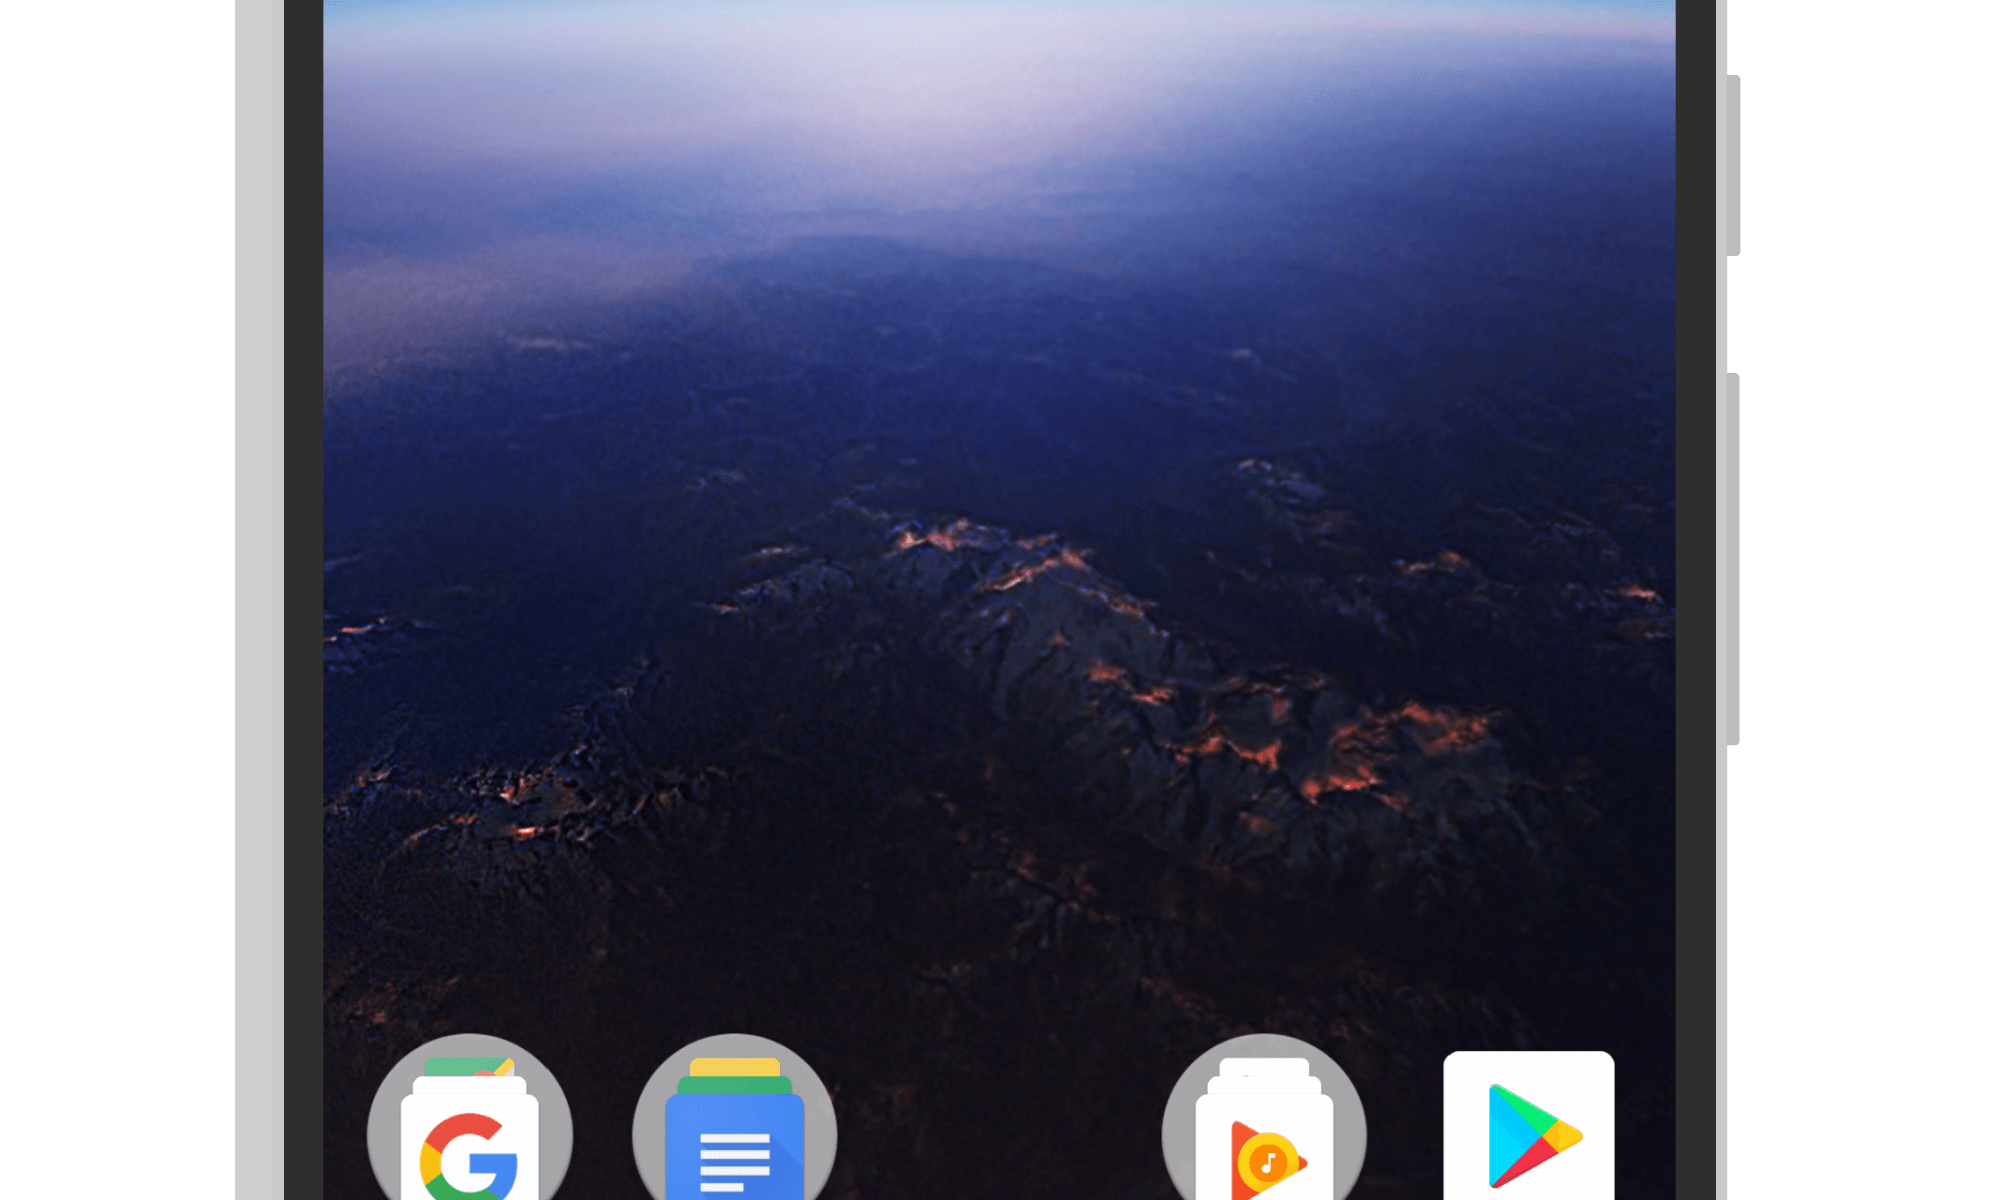 Android Oreo on Nexus 6P